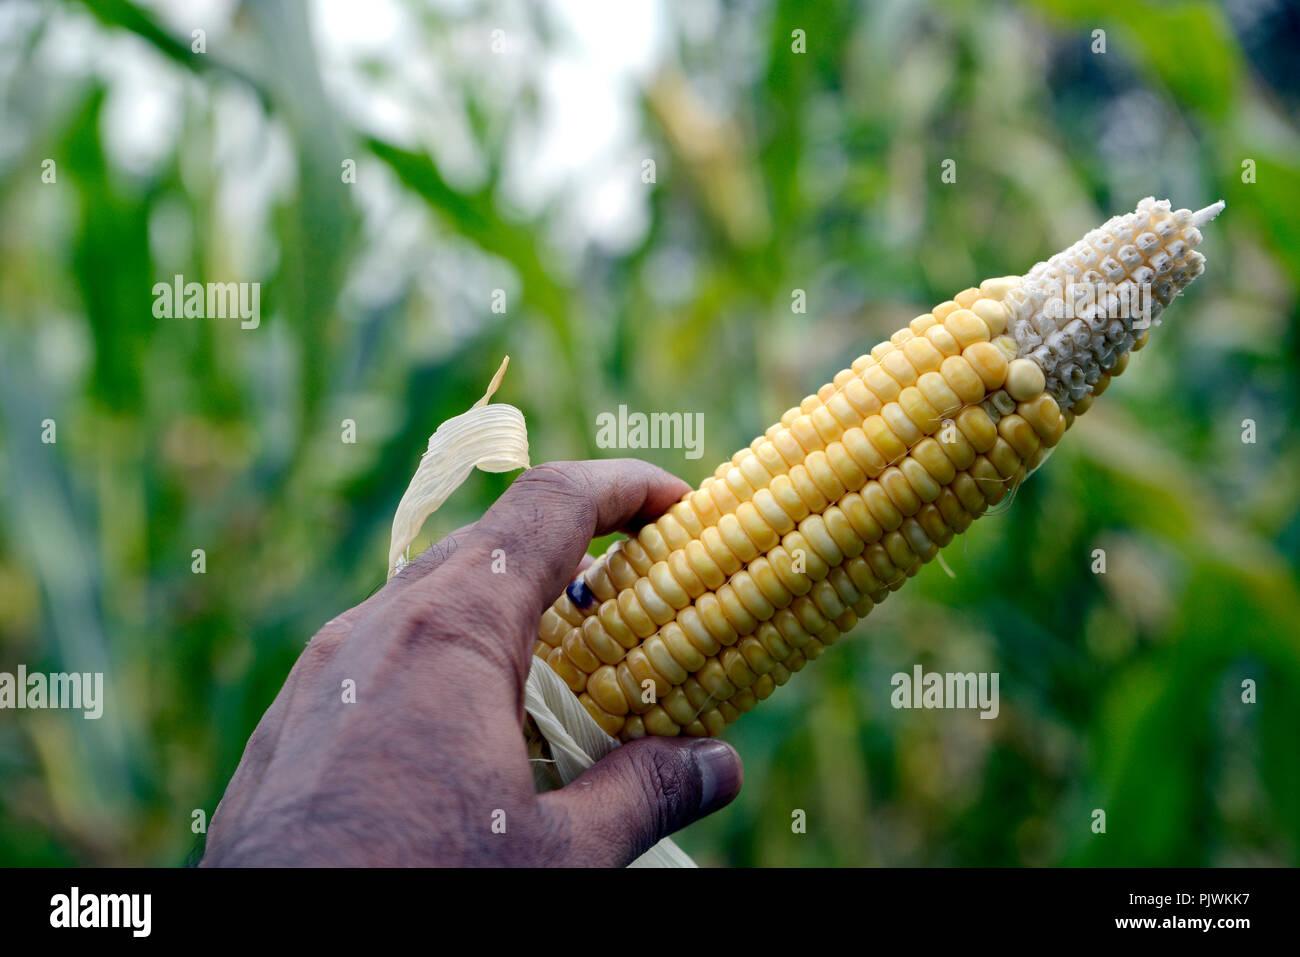 Corn Plants In The Field - Stock Image